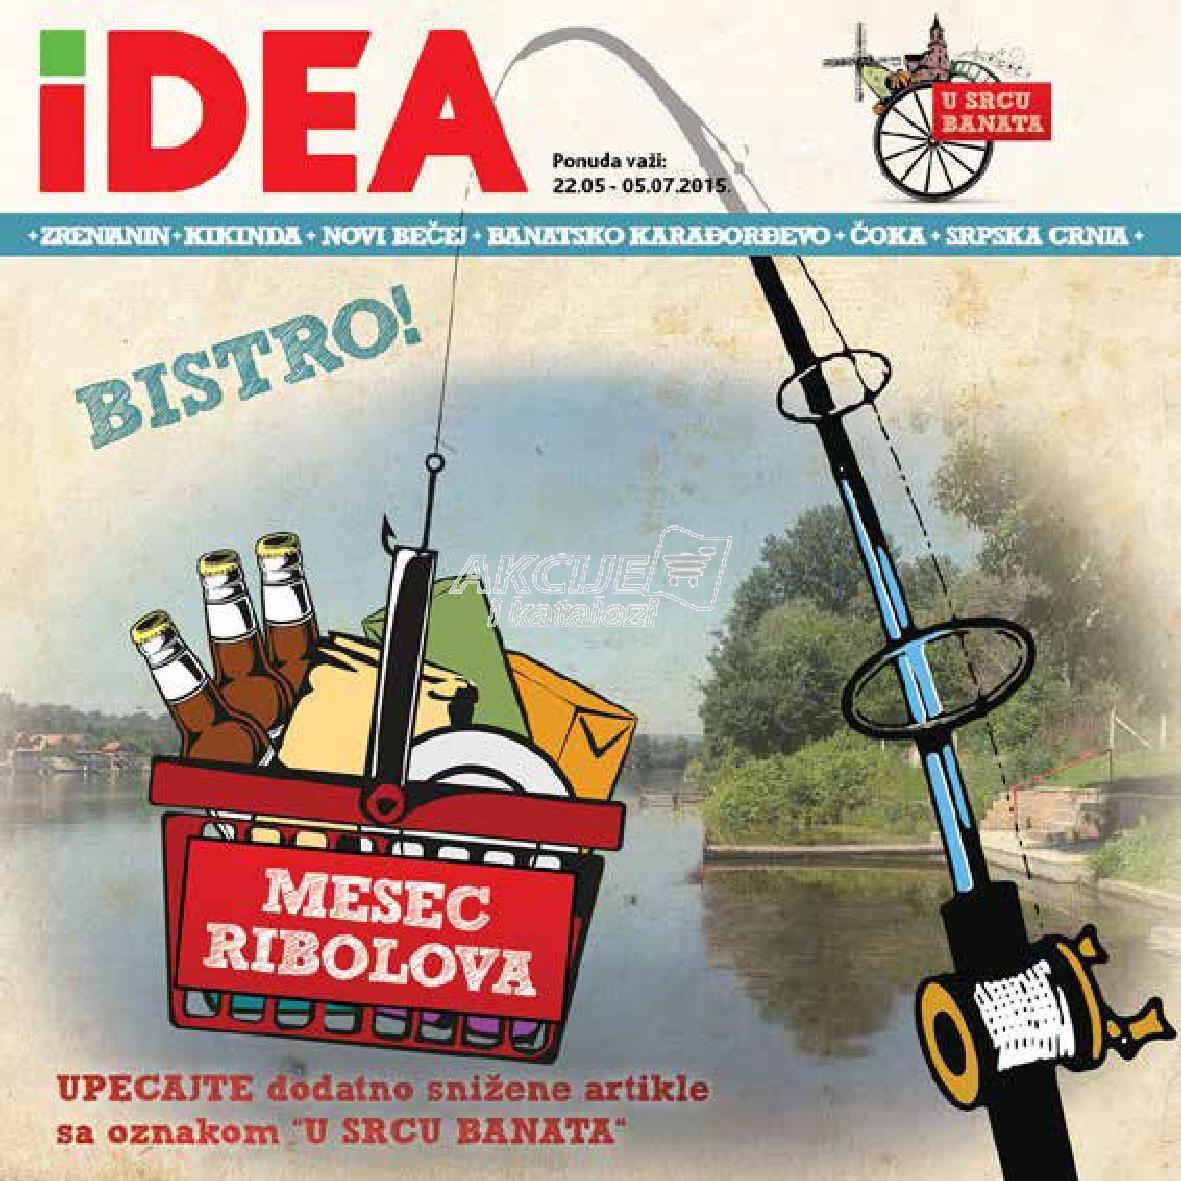 Idea - Redovna akcija mesec ribolova